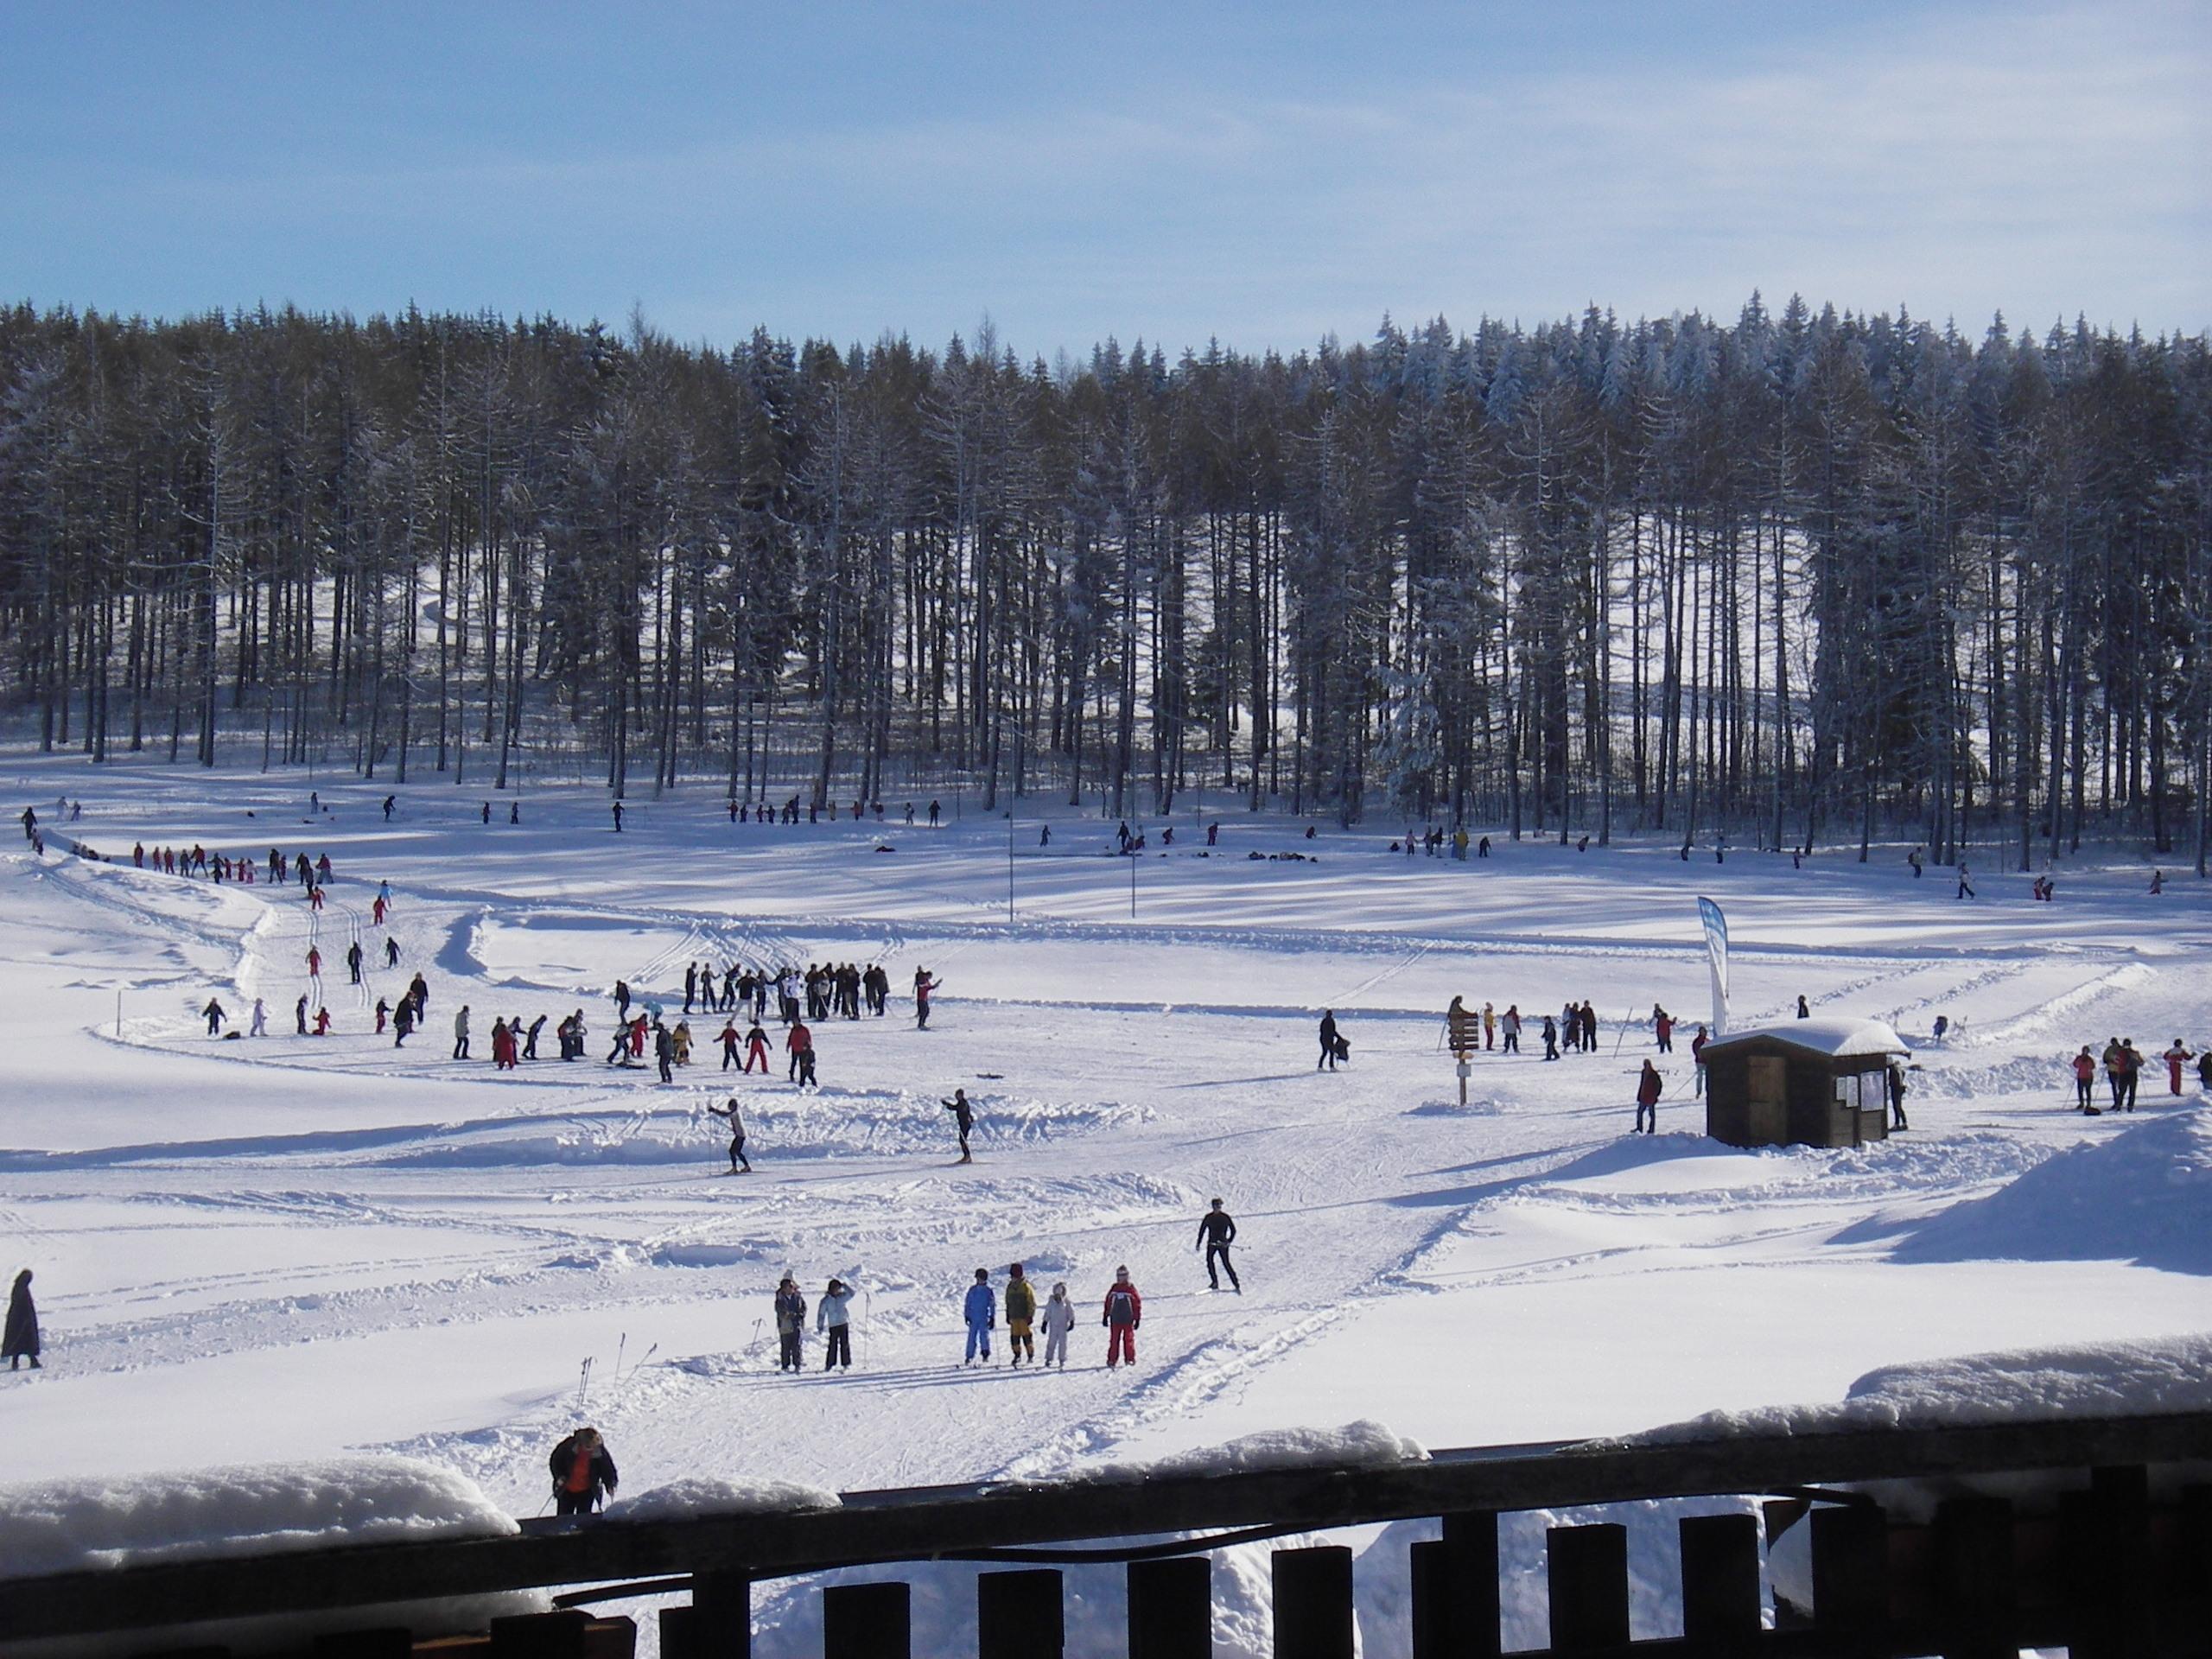 Effervescence sur le stade de neige avec l'Ecole de Ski